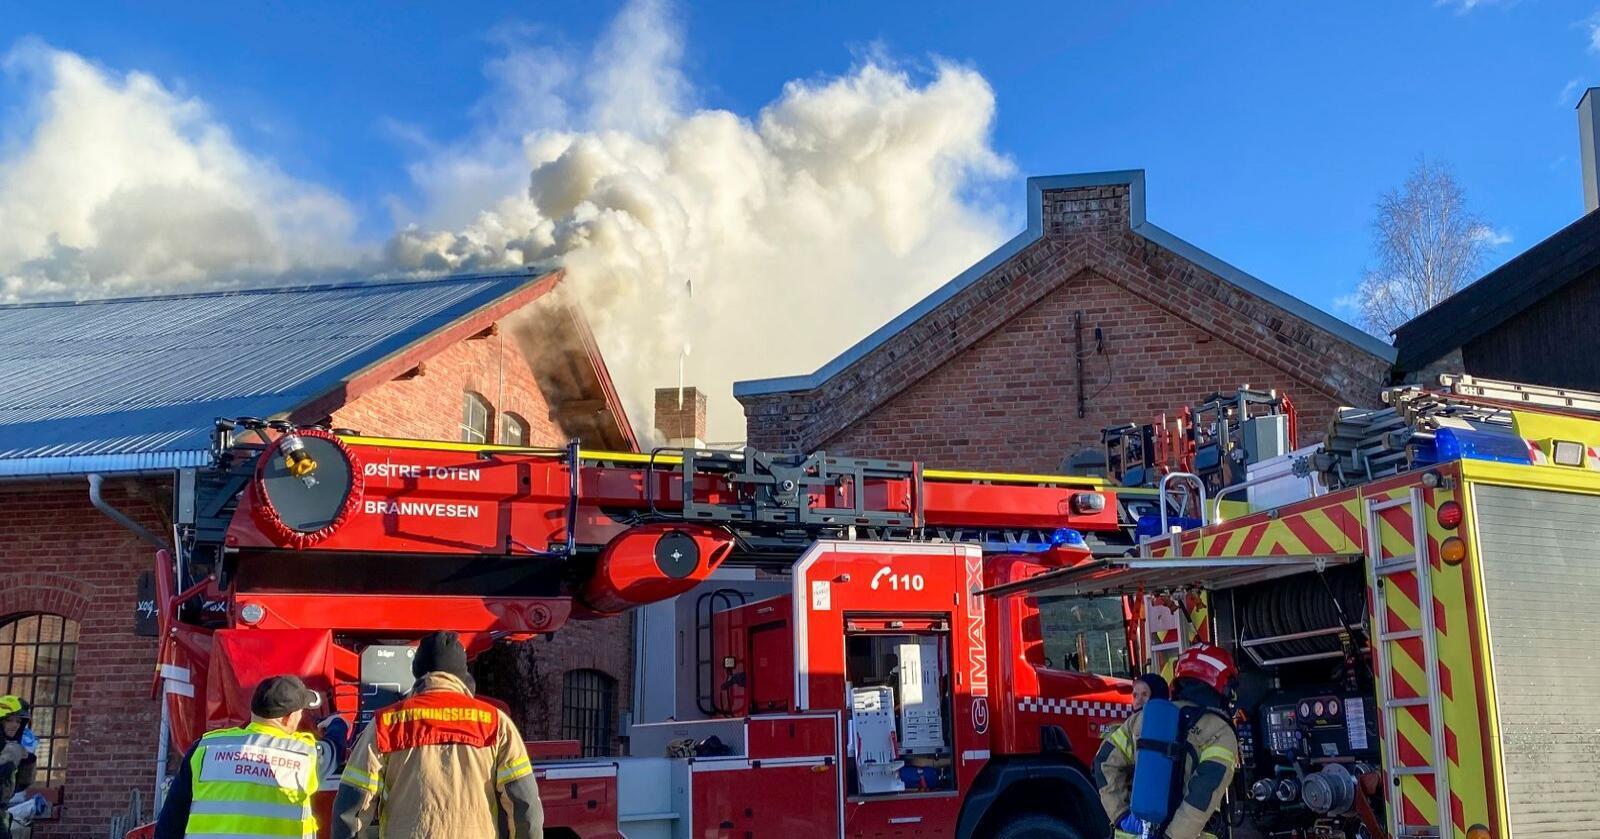 Kapp 20210226. Det brenner i den gamle Melkefabrikken på Kapp i Østre Toten, Et gammelt og delvis verneverdig industriområde ved Mjøsa.Foto: Ole Kristian Bjellaanes / NTB